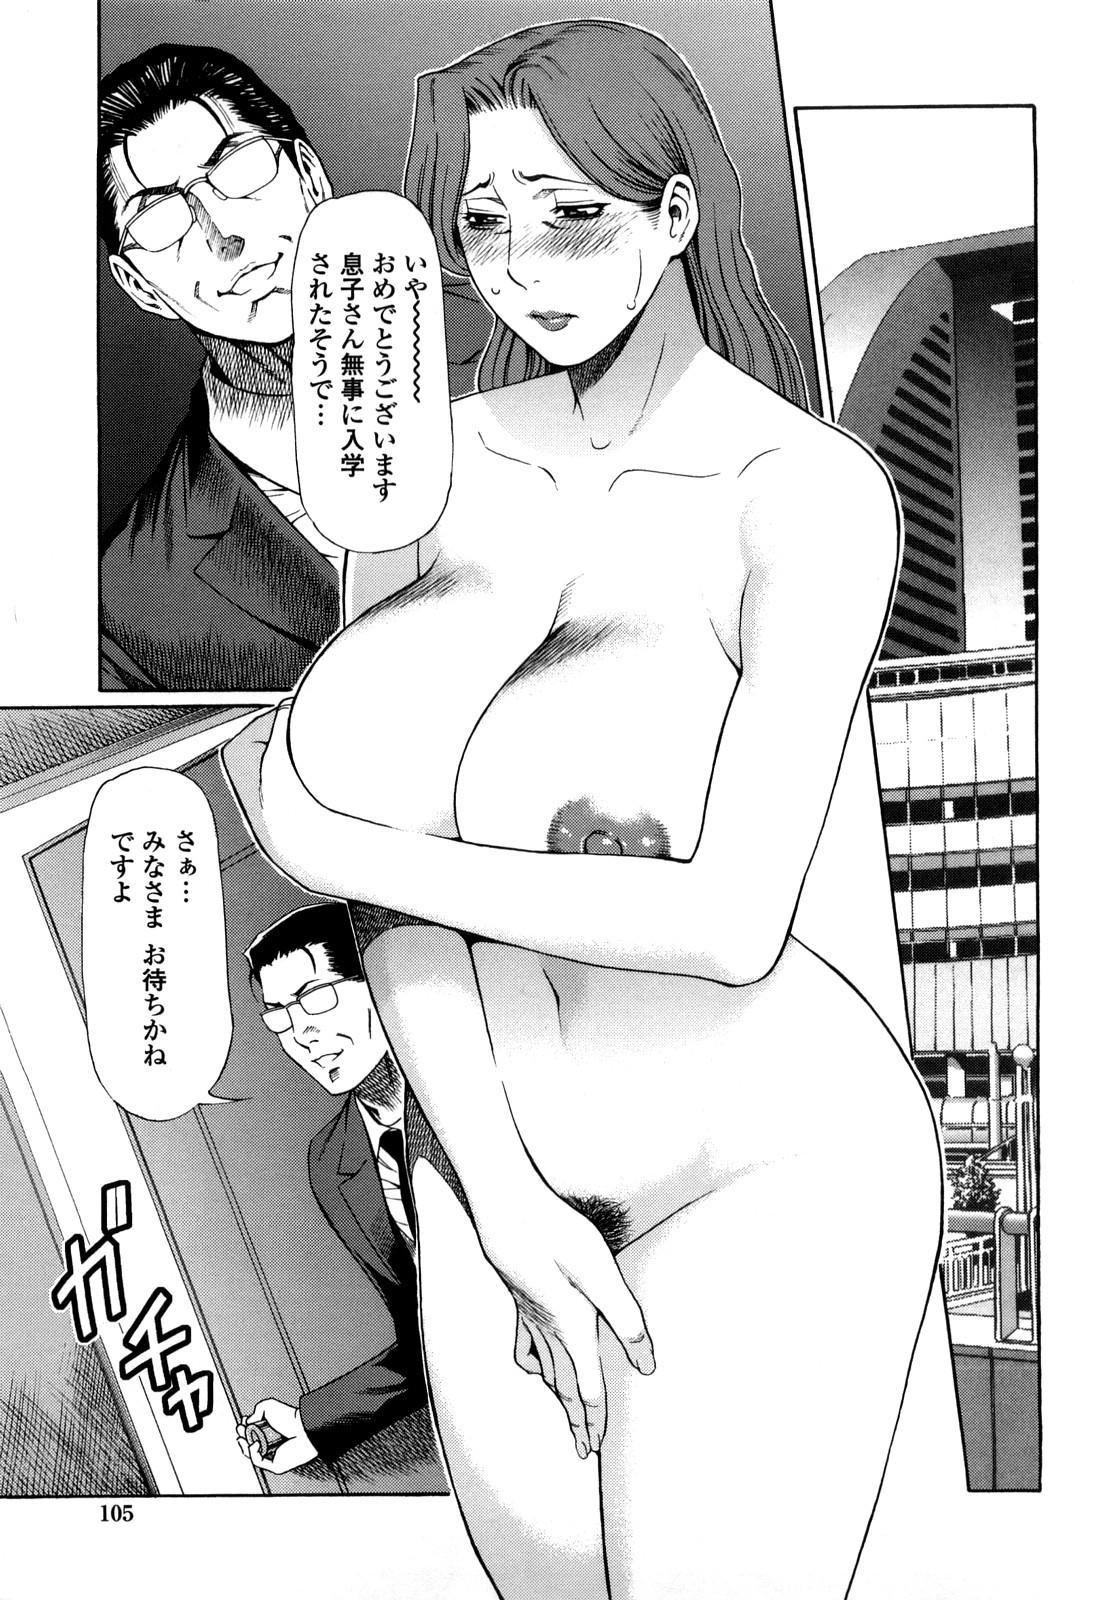 [Takasugi Kou] Kindan no Haha-Ana - Immorality Love-Hole [Decensored] 106